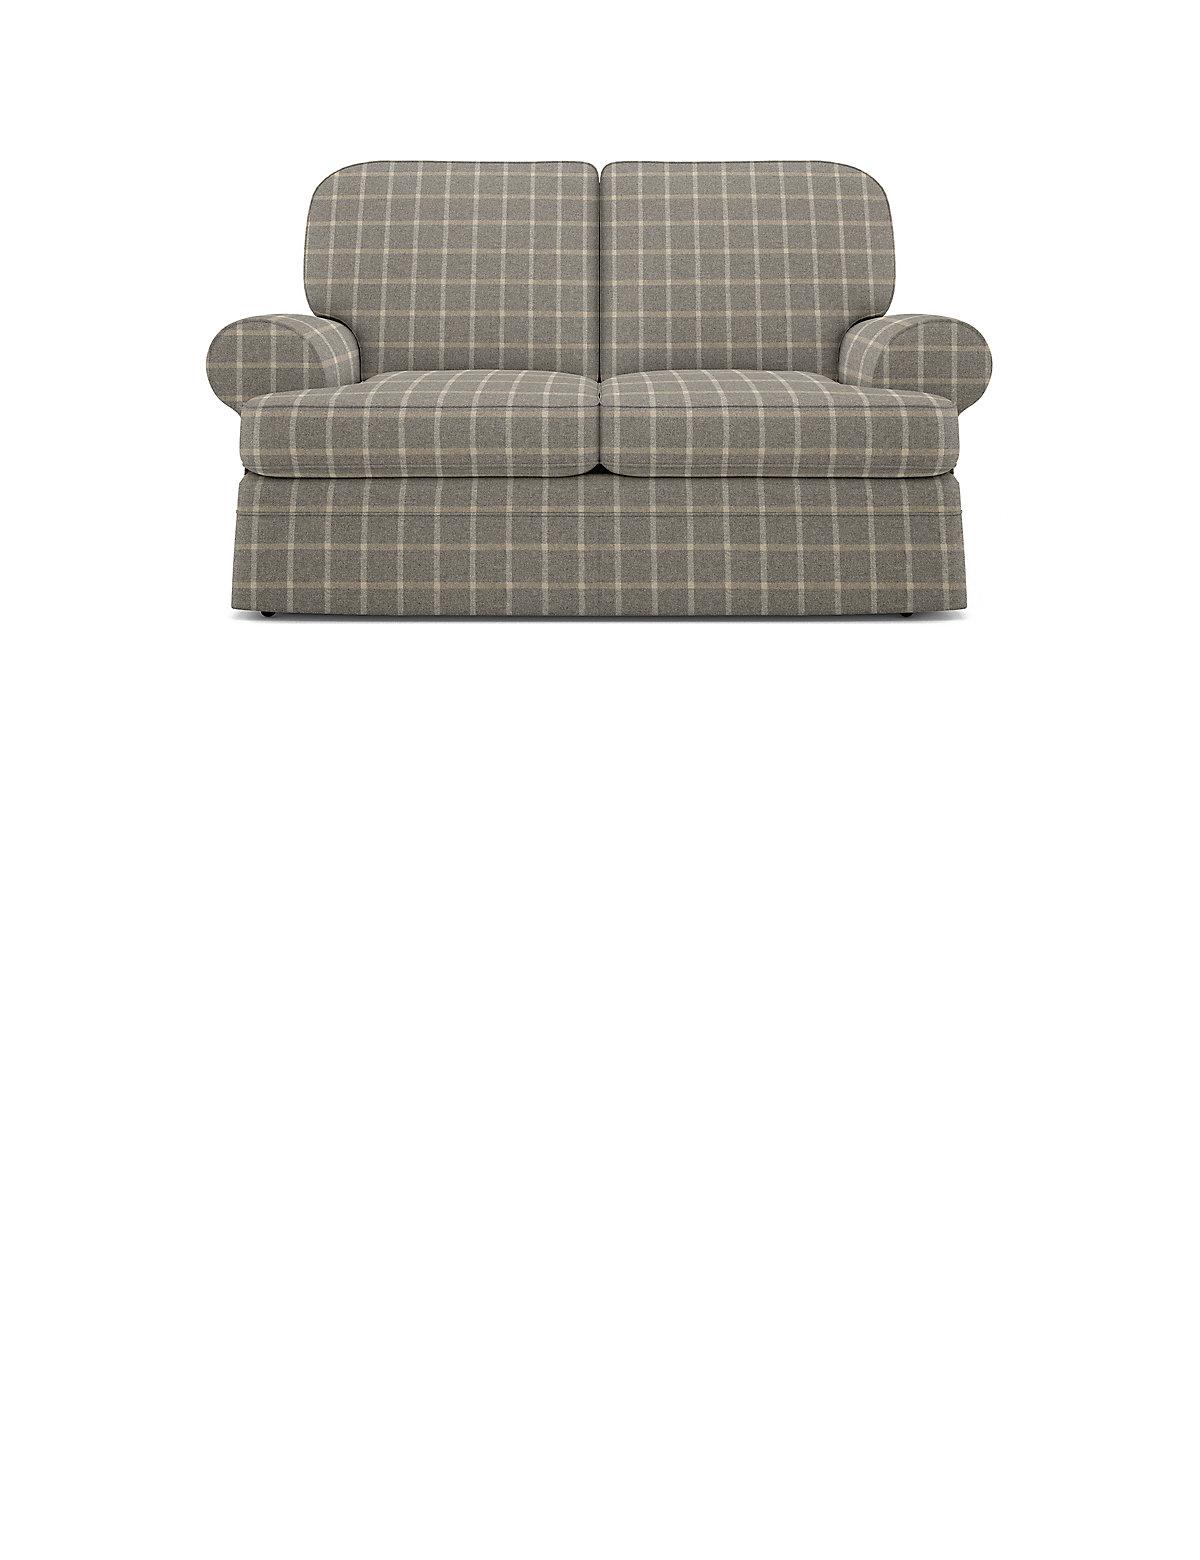 Charlotte Compact Sofa